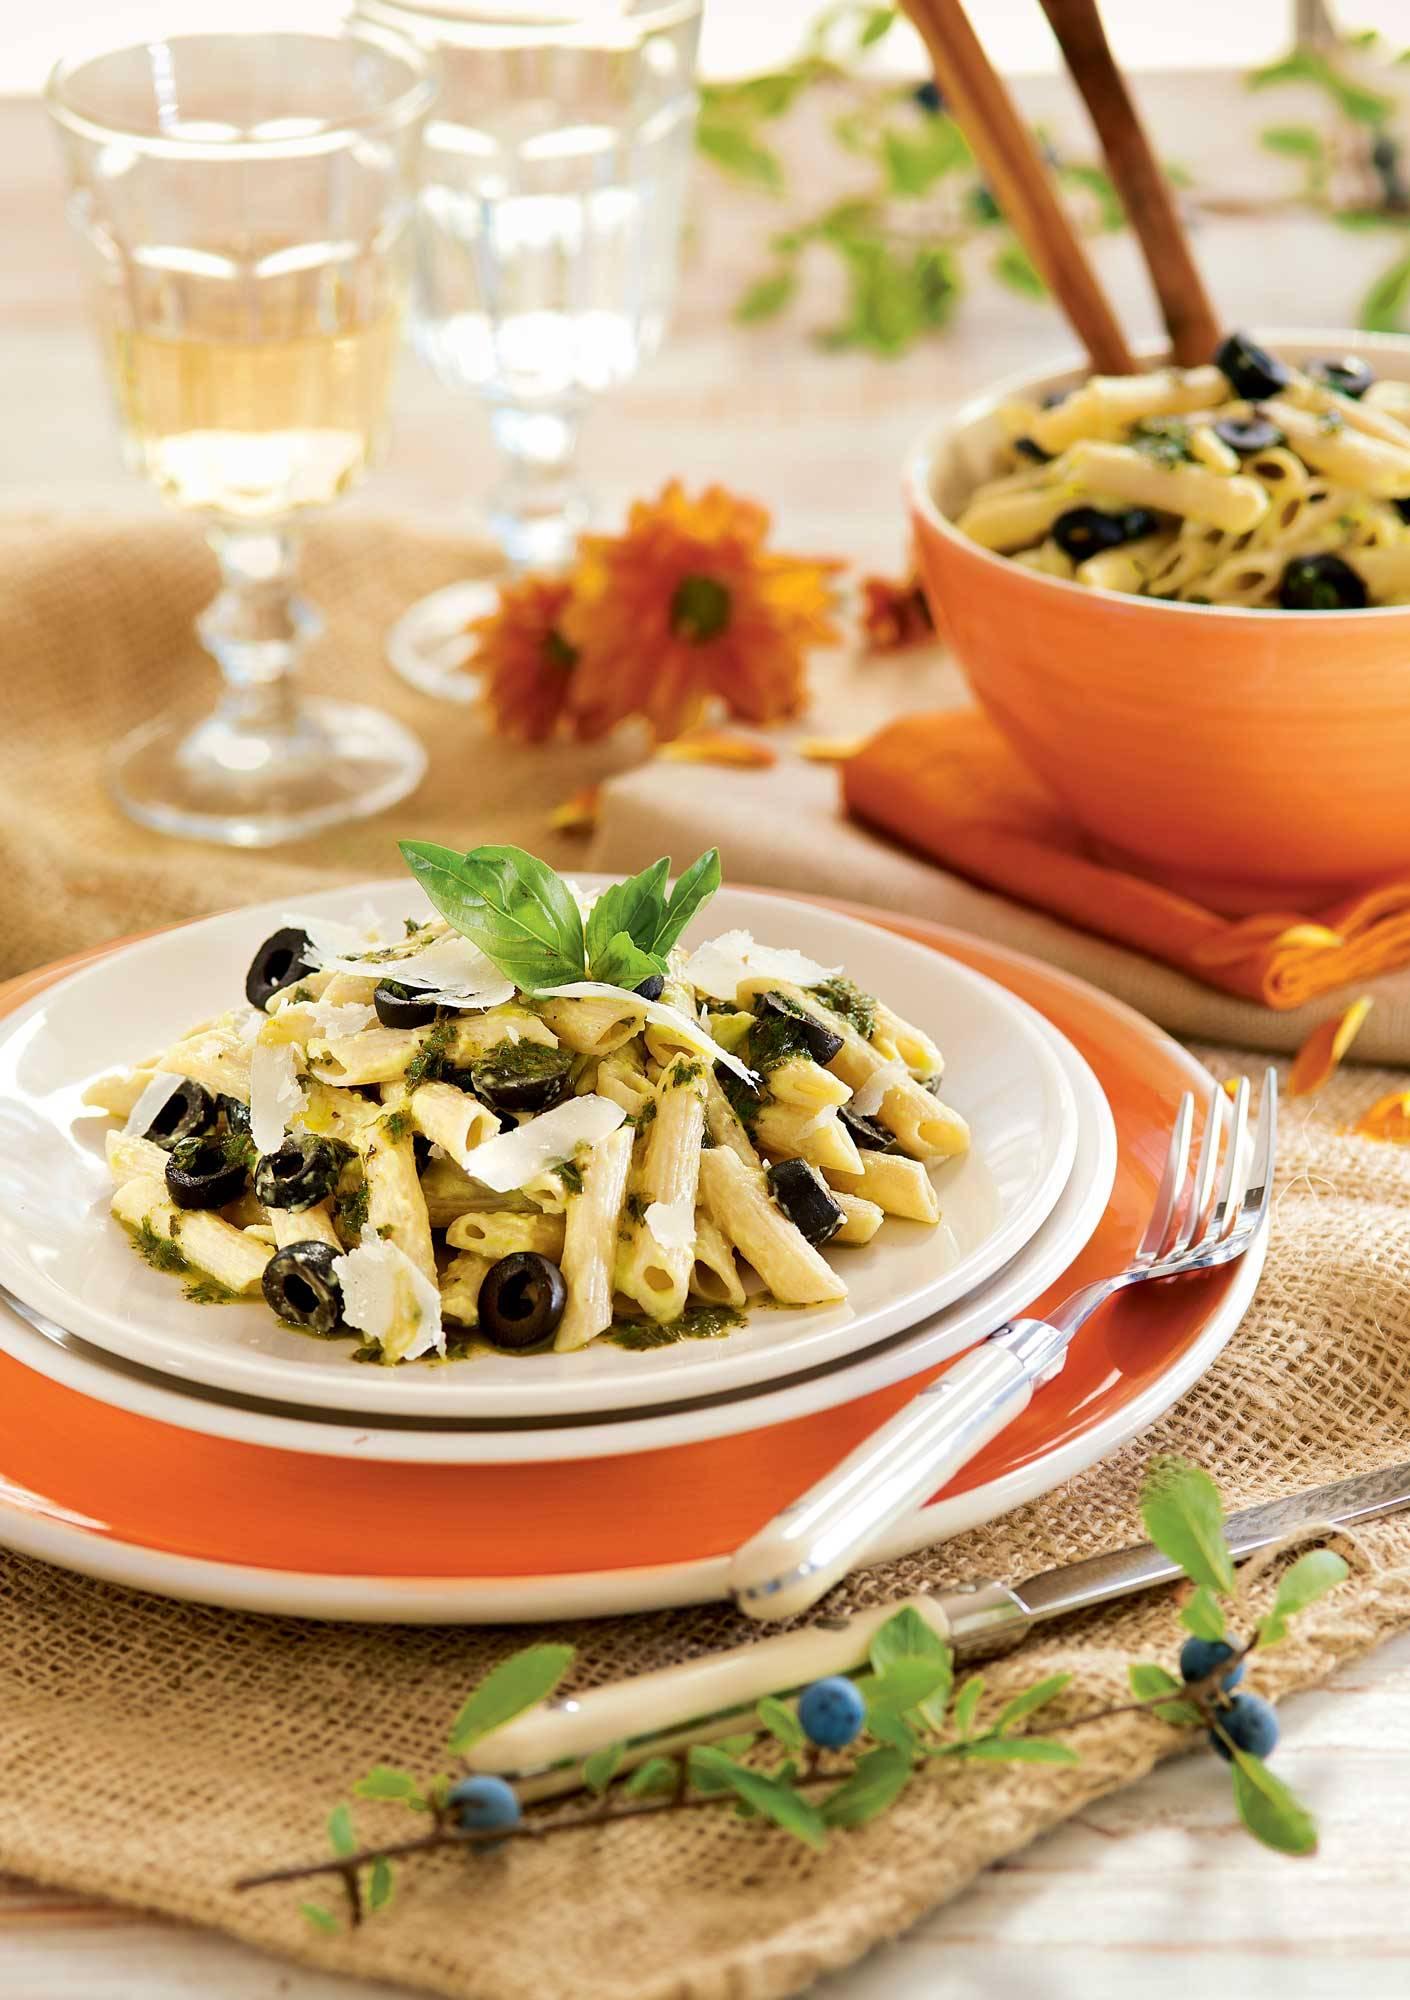 recipes-with-avocado-pasta-with-basil-and-avocado-00391549